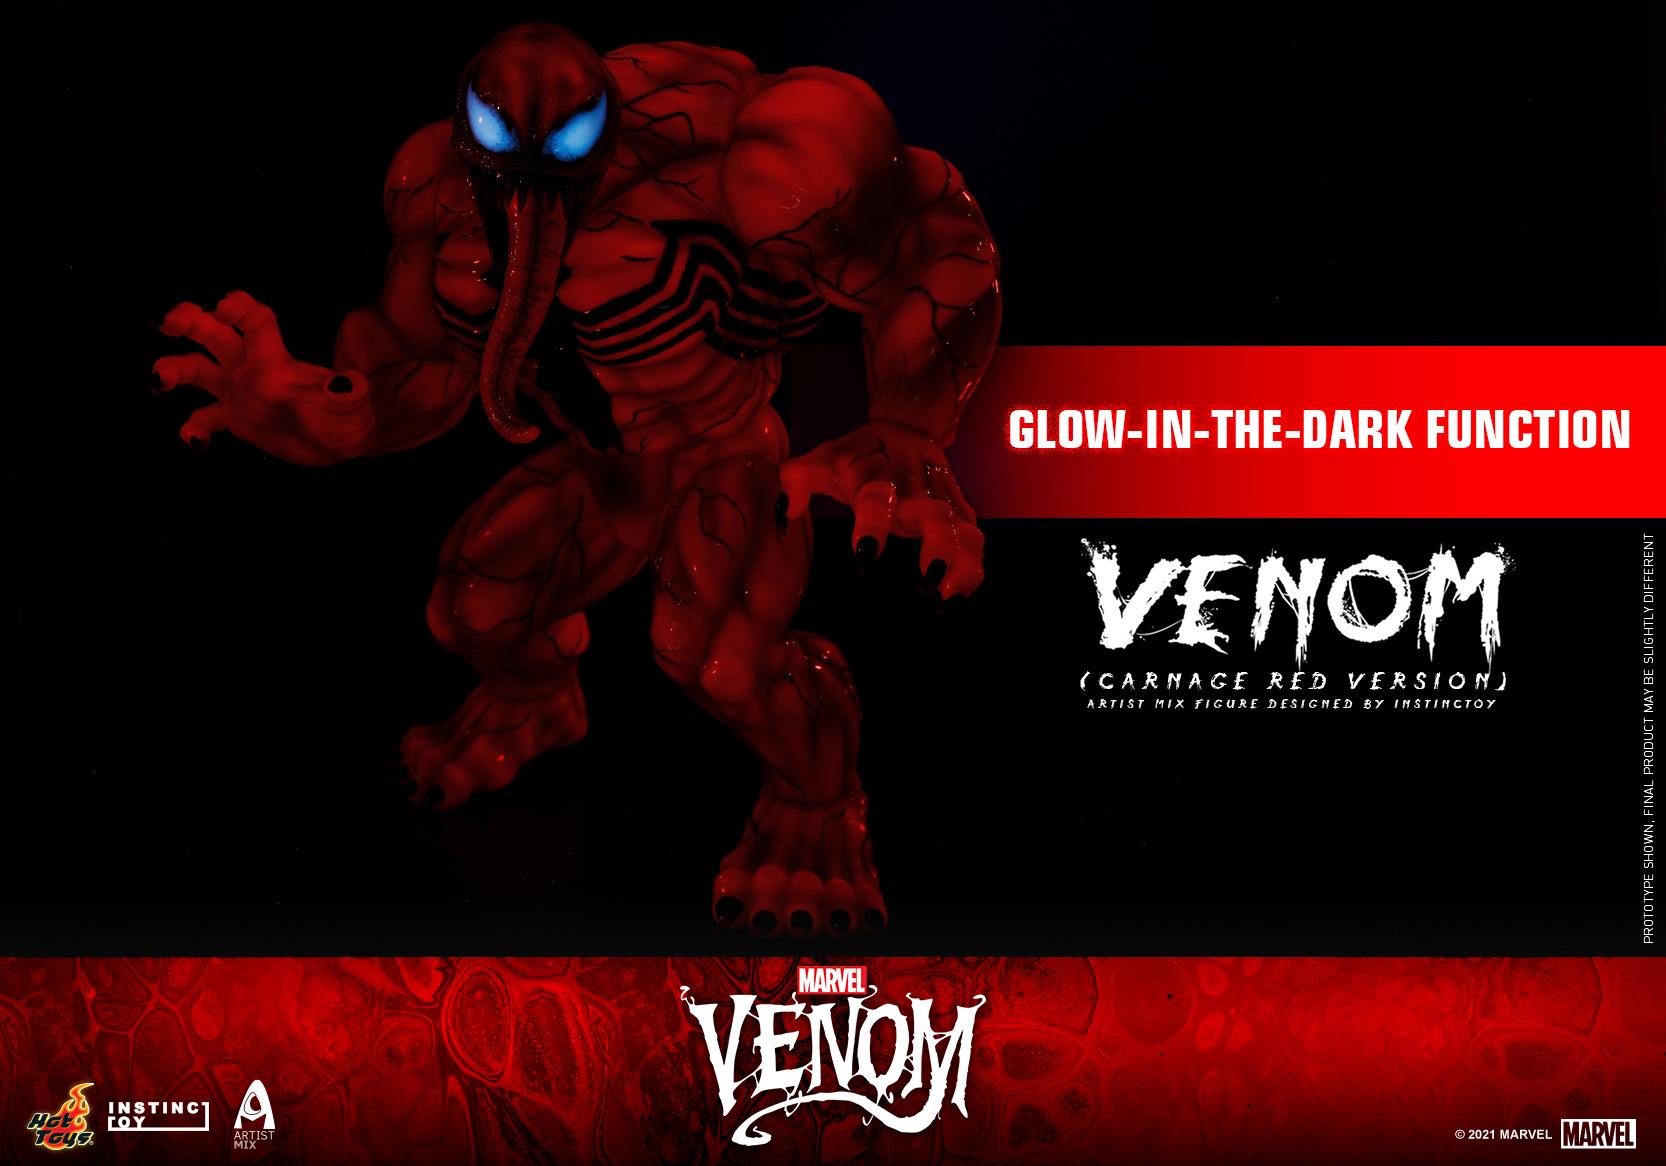 Hot Toys - Venom (Carnage Red Version) Artist Mix Figure Designed by Instinctoy_PR3